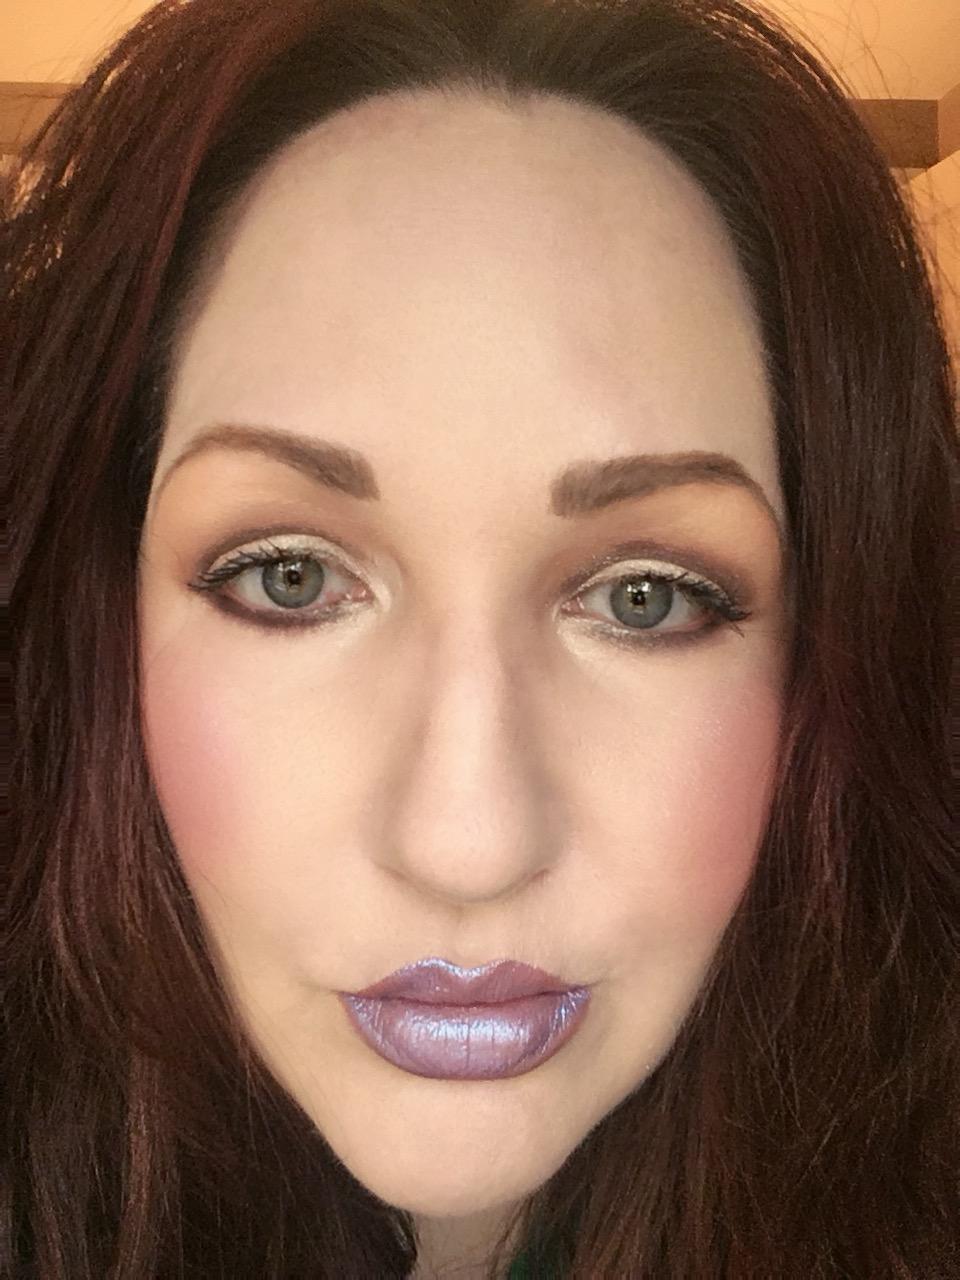 Kat Von D Beauty - Everlasting Liquid Lipstick swatches